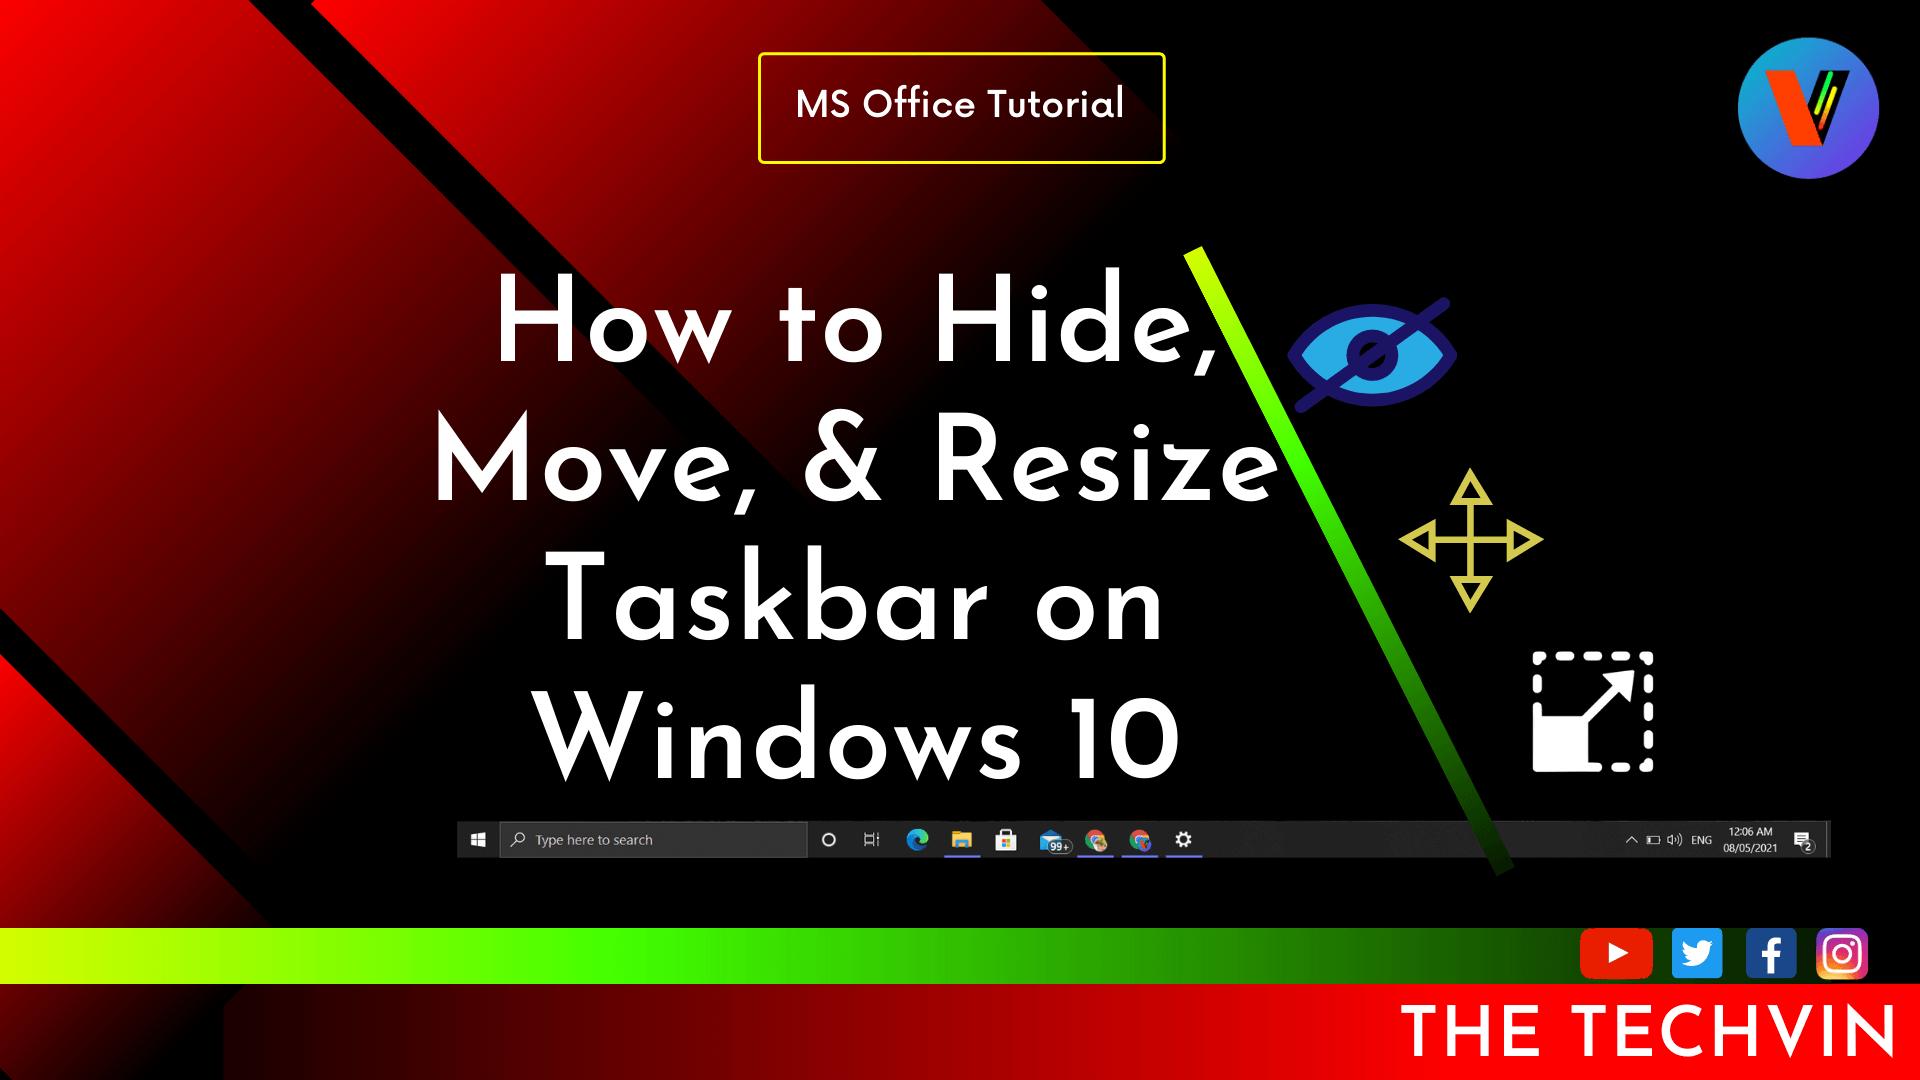 How to Hide Move Resize Taskbar on Windows 10